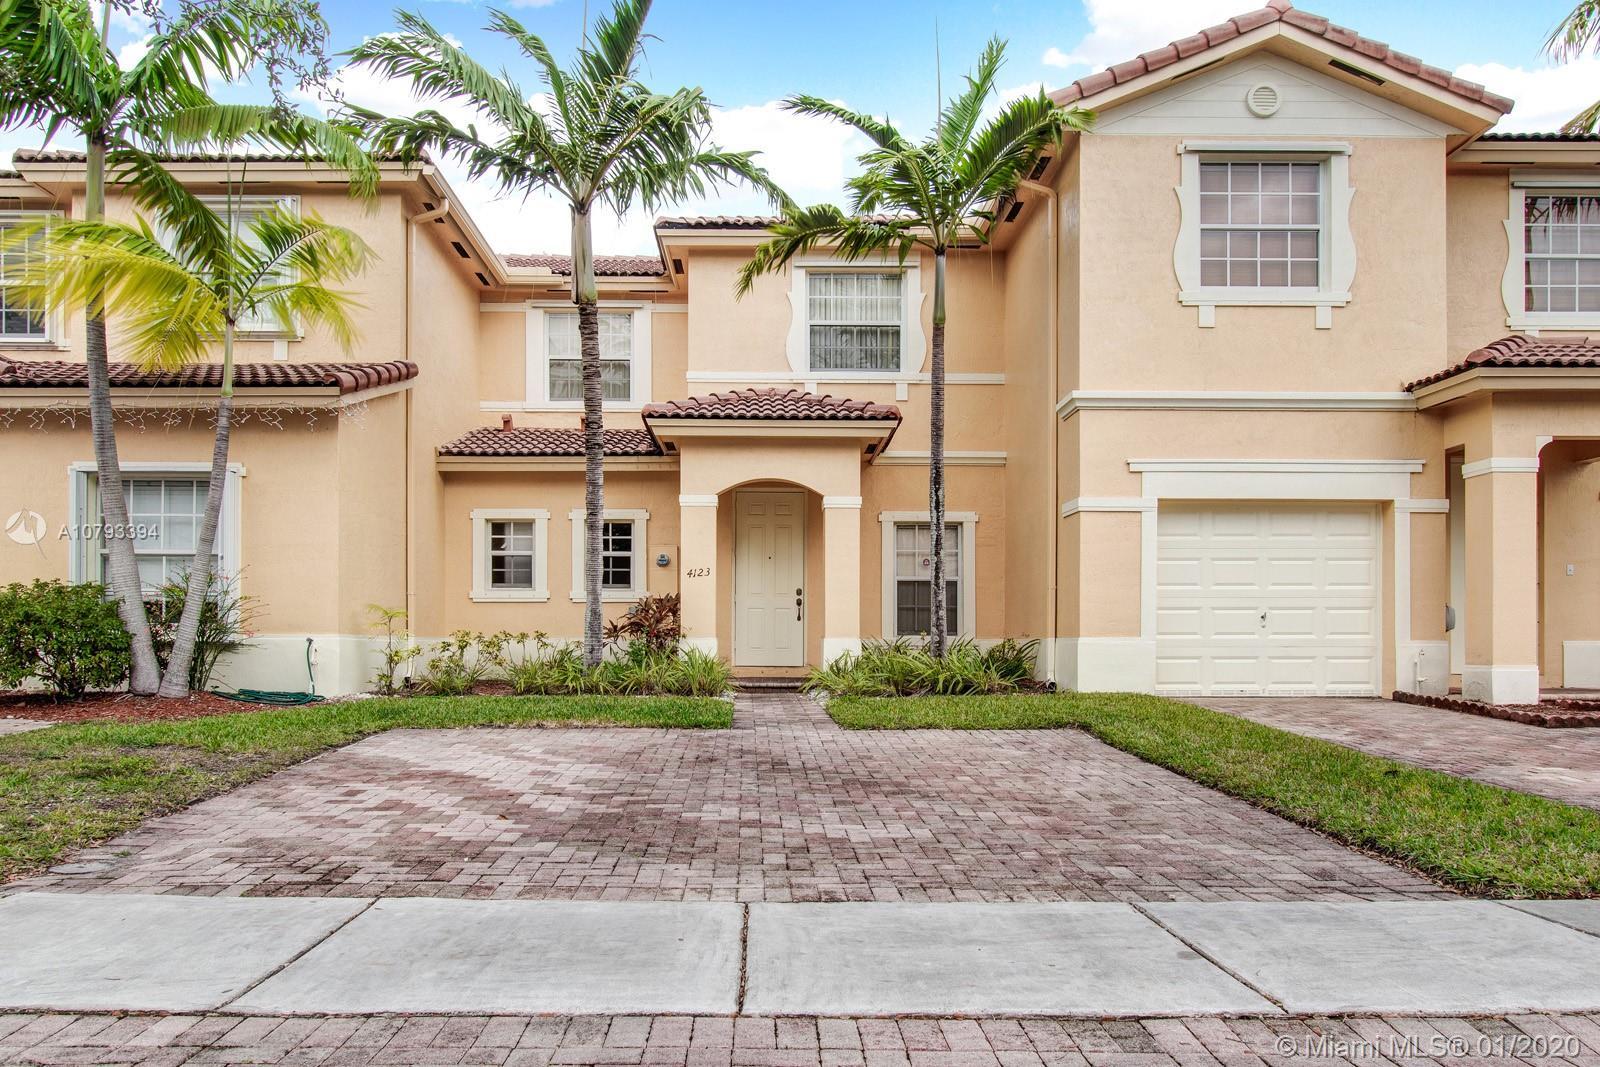 4123 NE 24th St, Homestead, FL 33033 - Homestead, FL real estate listing